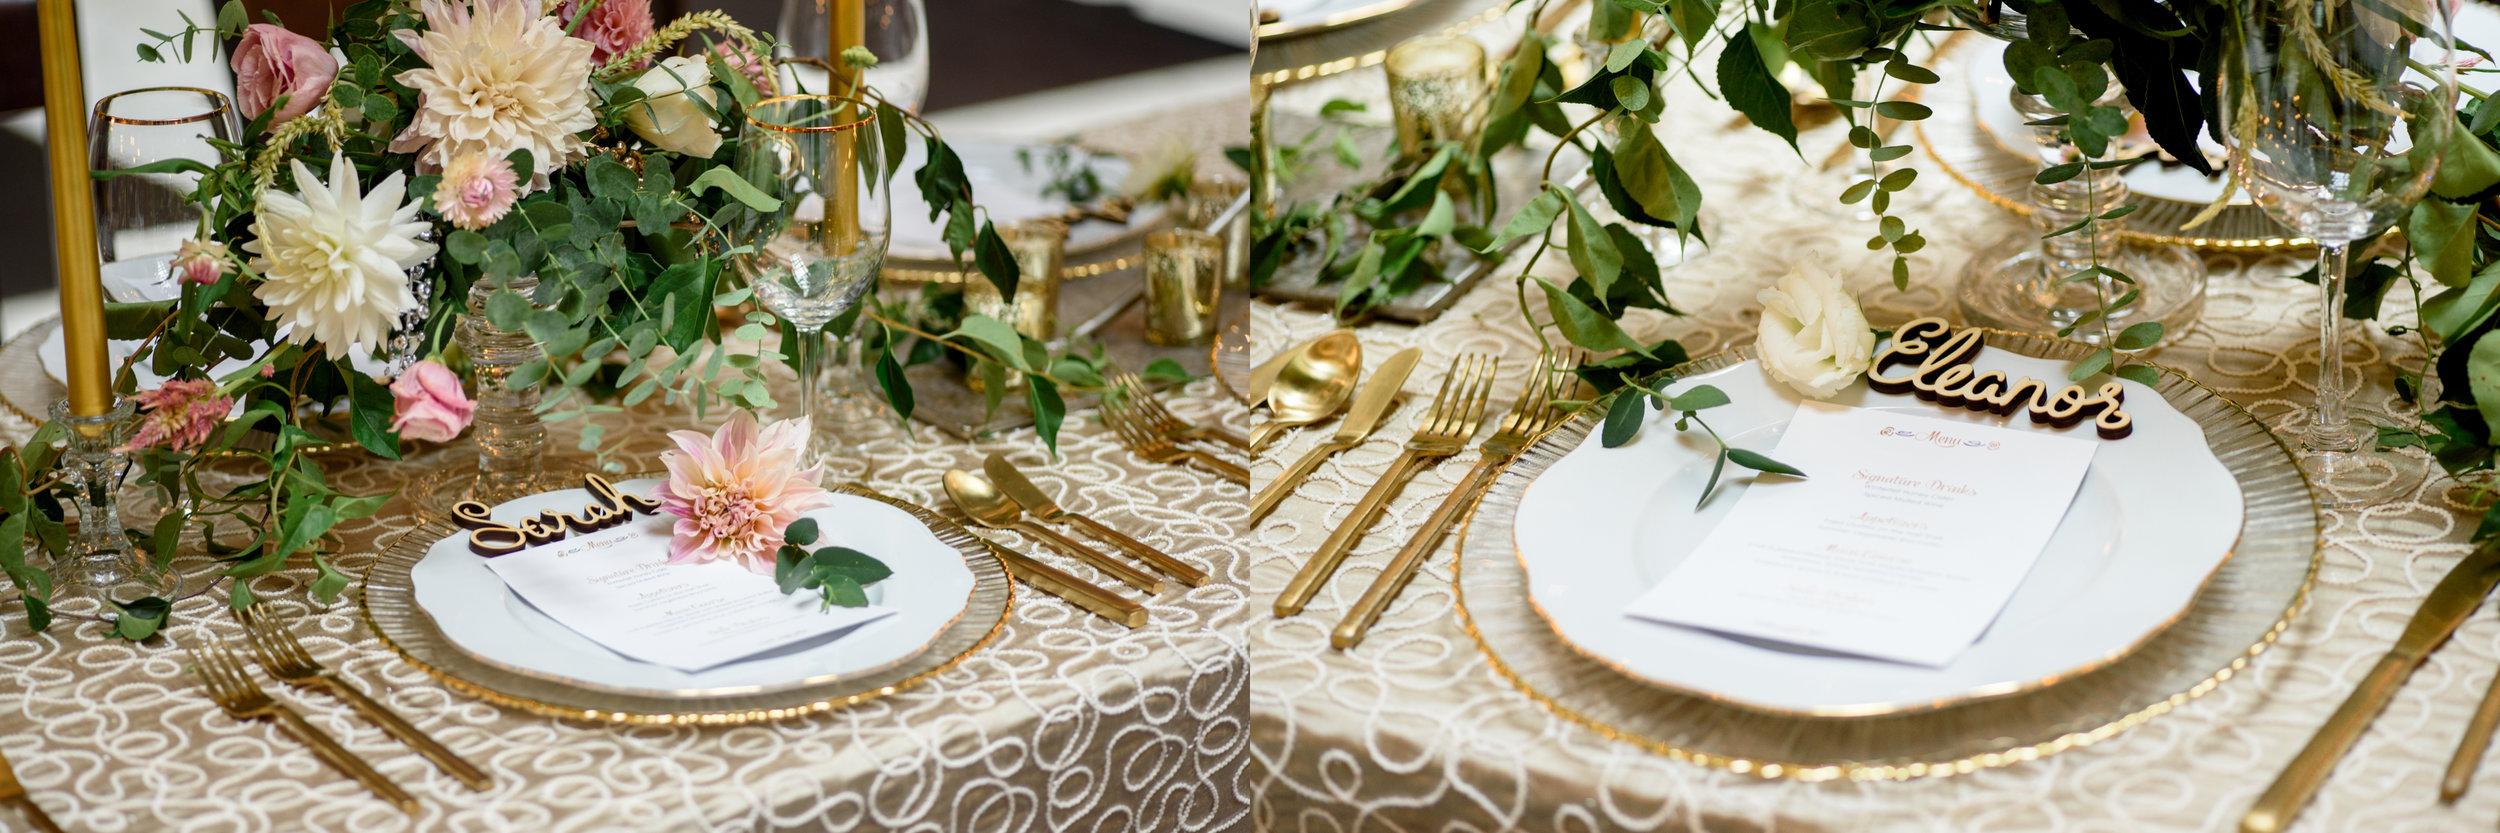 George_Peabody_Library-Wedding_Styled_Shoot-30.jpg